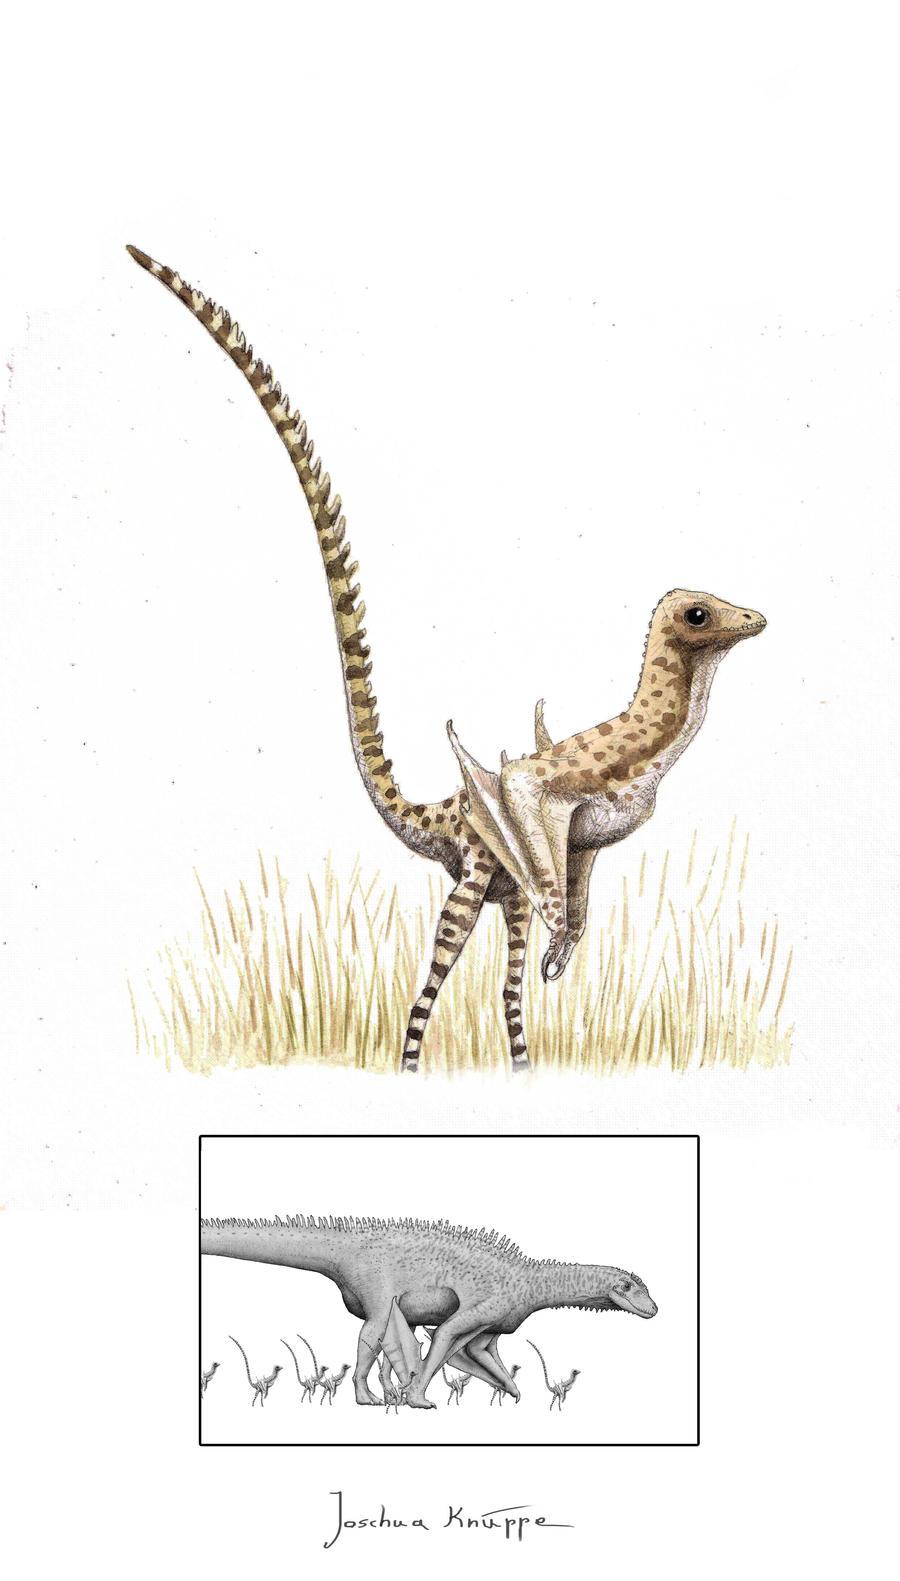 Juvenile Spinolurus